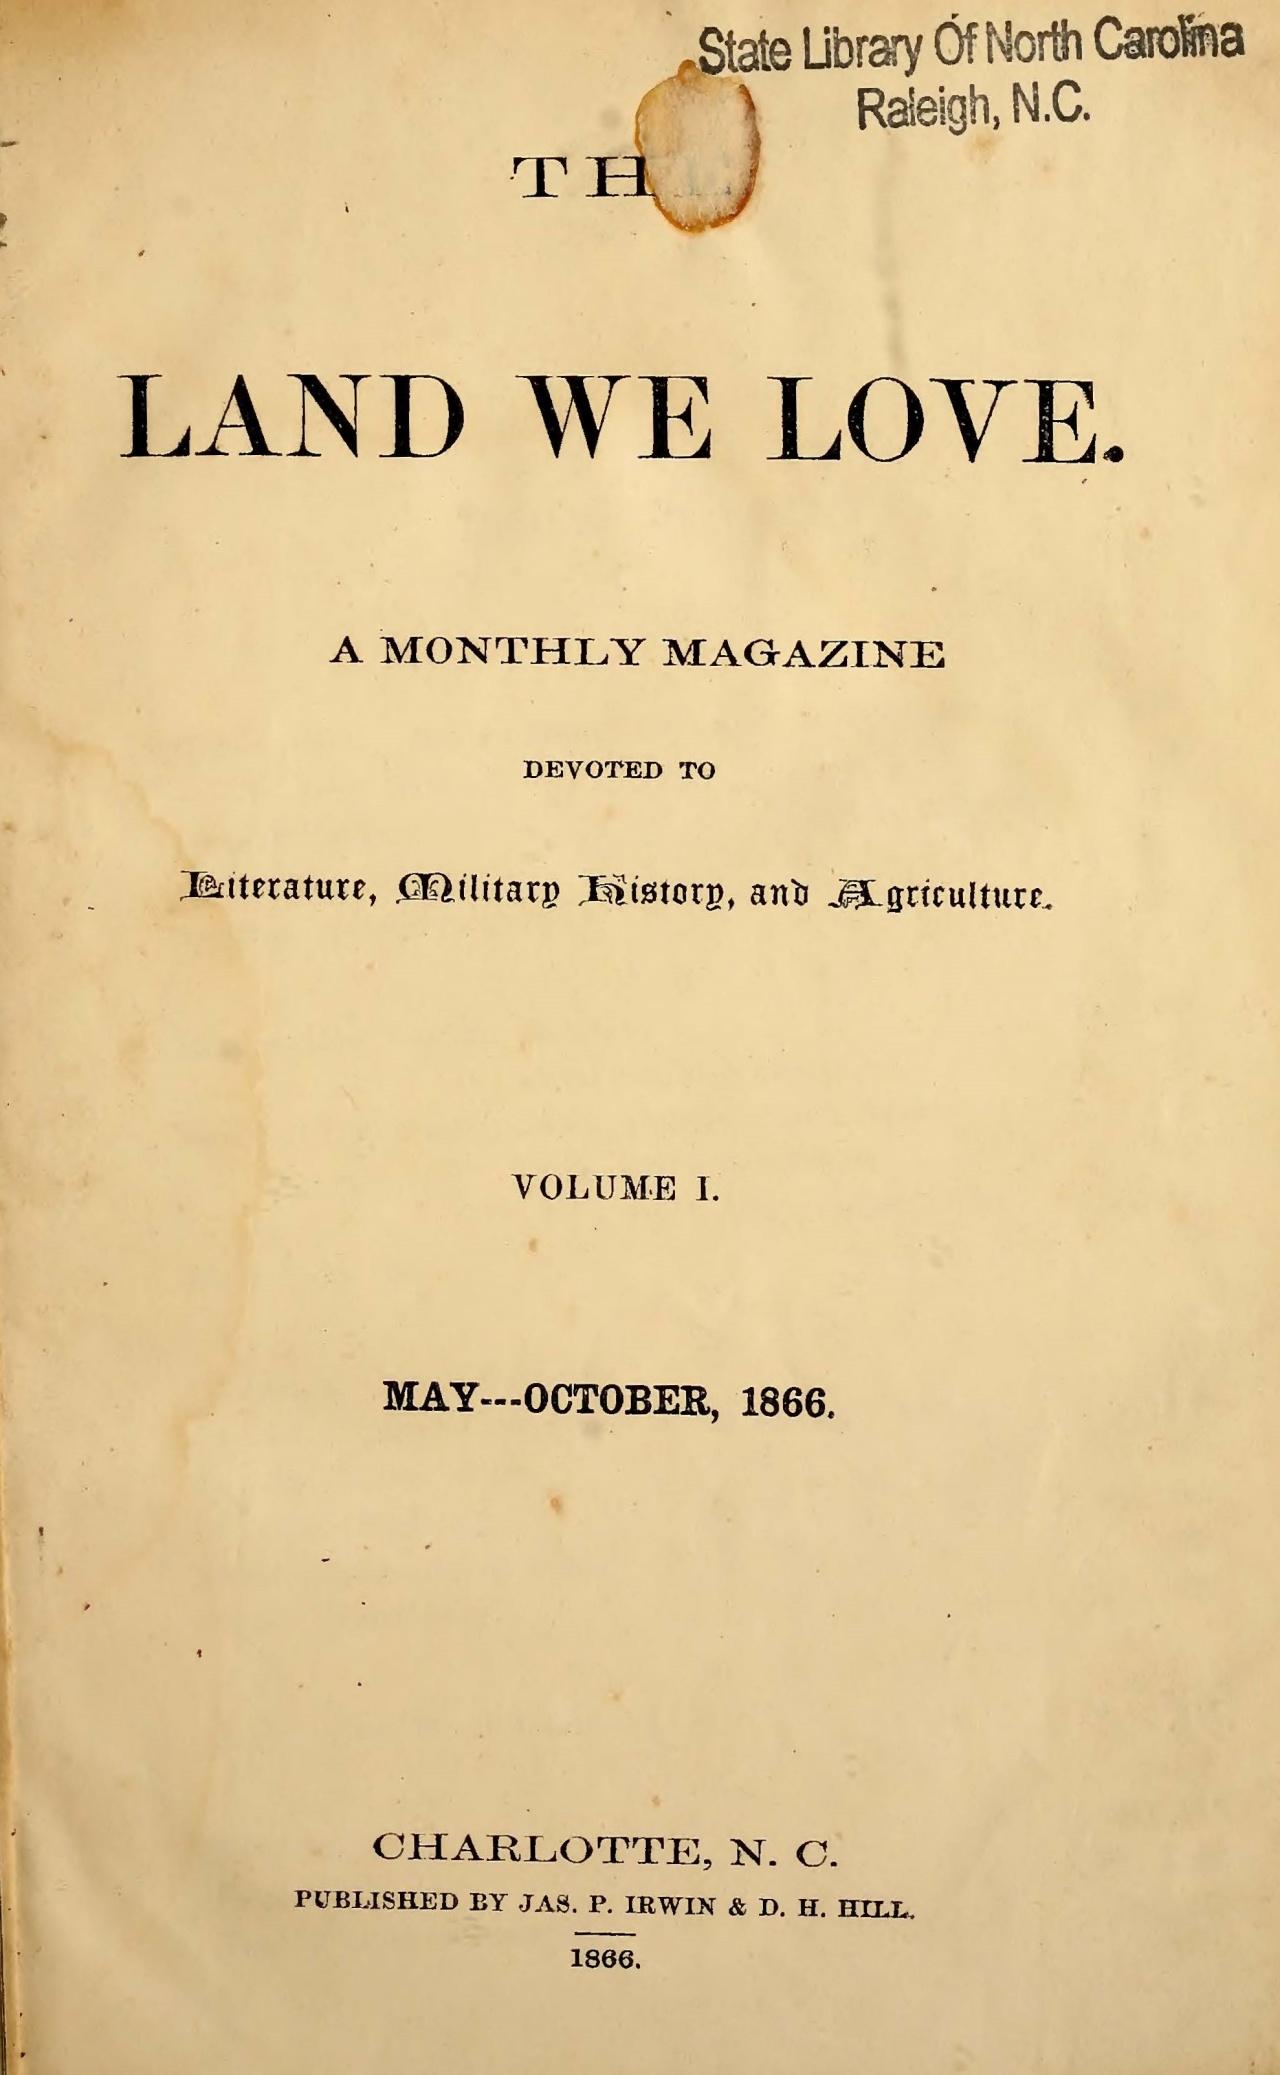 Hill, Daniel Harvey, The Land We Love, Vol. 1 Title Page.jpg